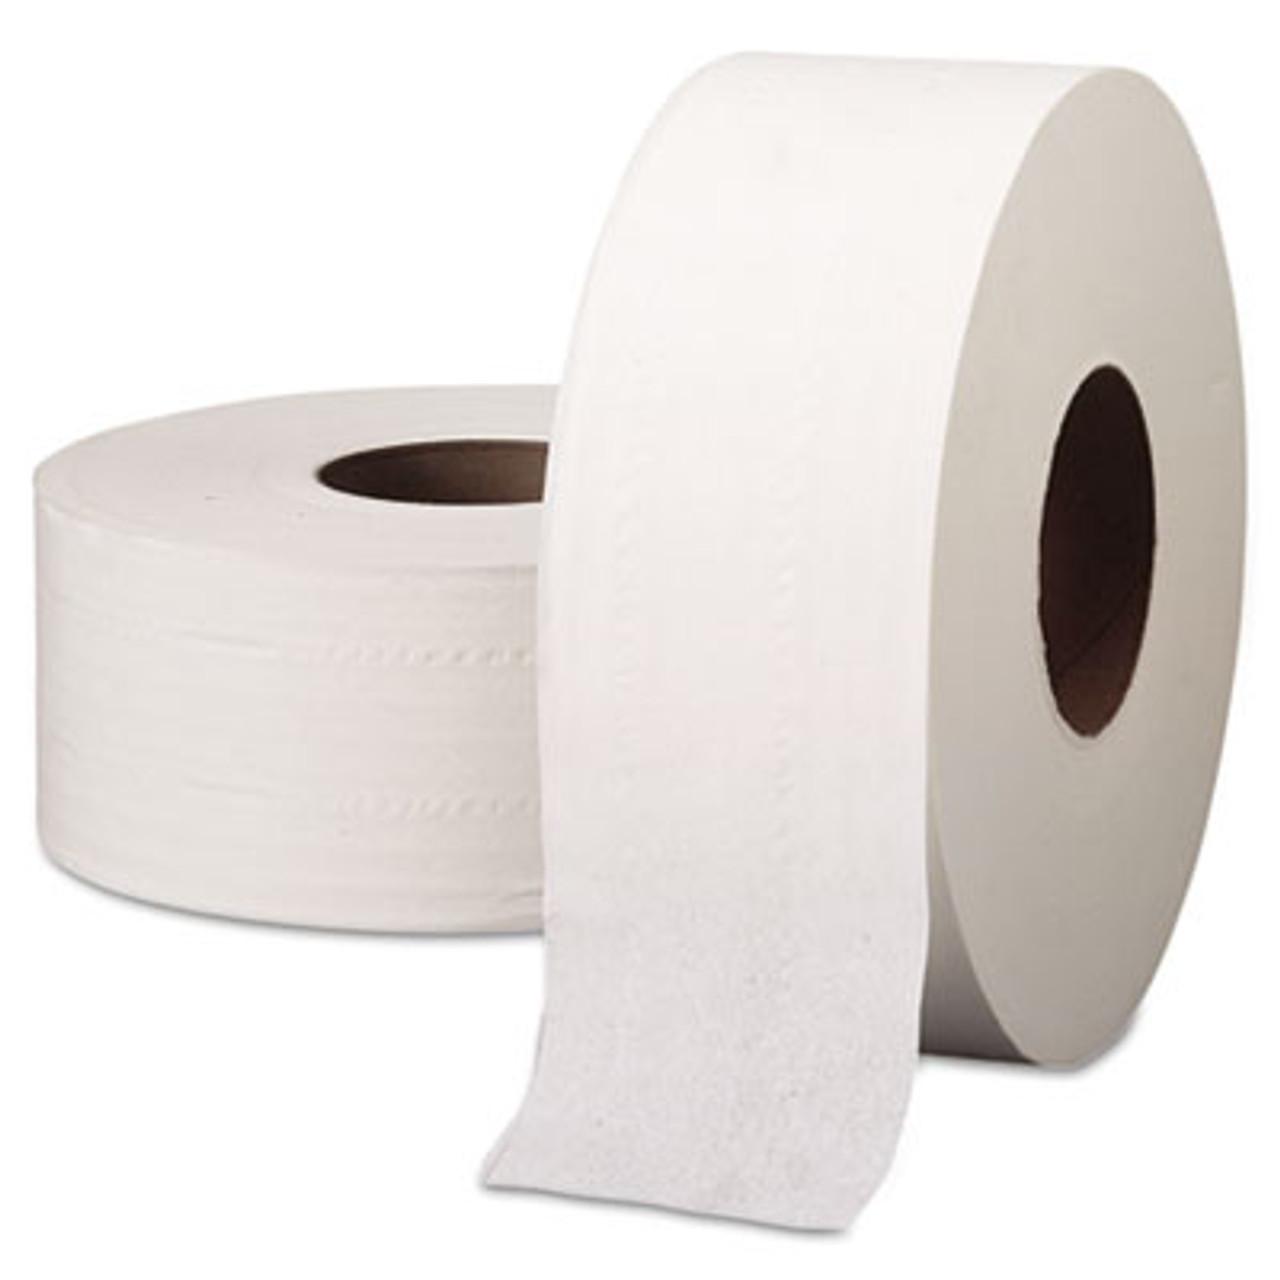 Kcc 03148 33 43 Essential Jrt Jumbo Roll Bathroom Tissue Septic Safe 2 Ply White 1000 Ft 4 Rolls Carton